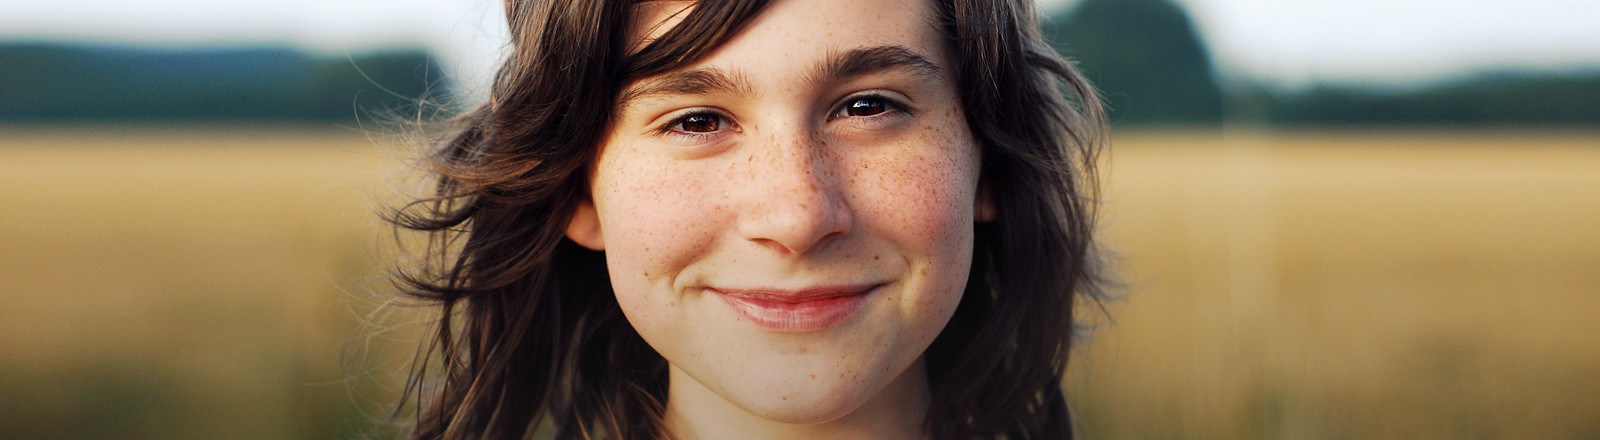 Eine junge Frau.